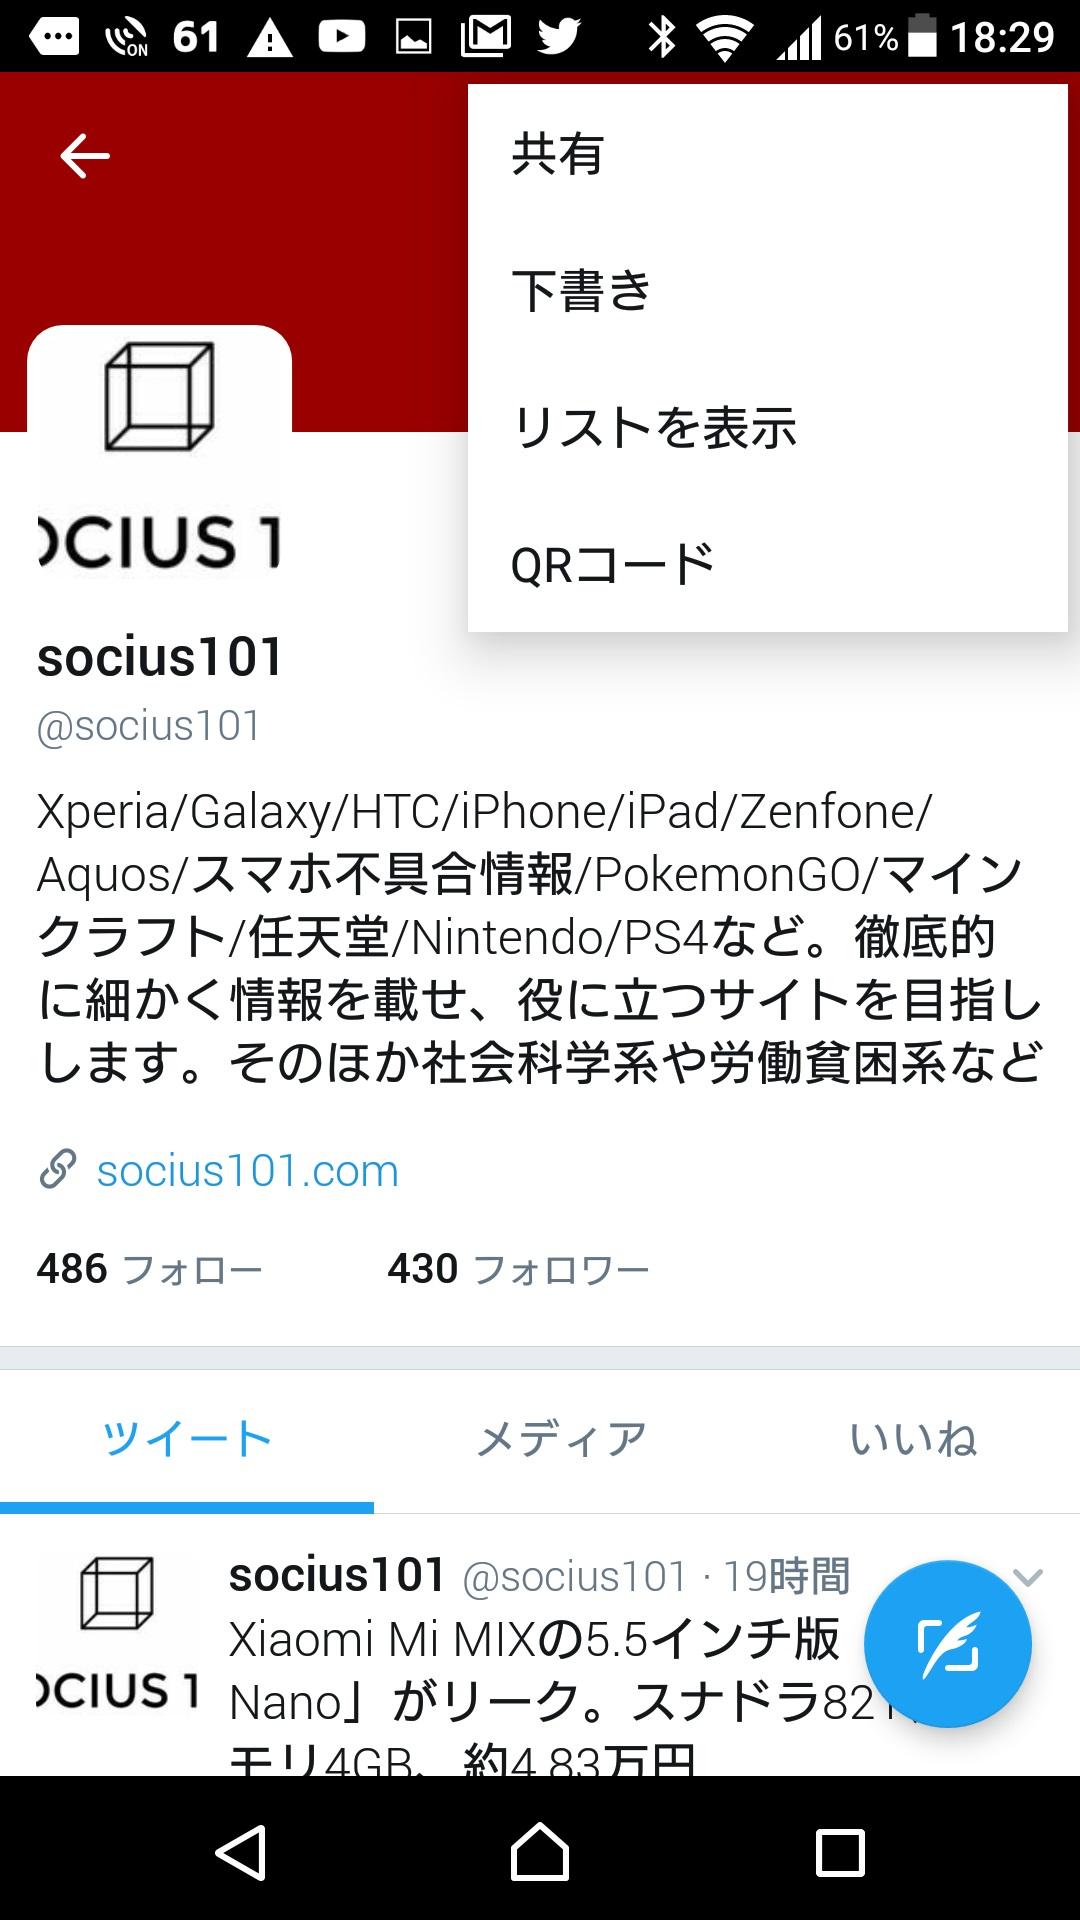 twitter_qr_2